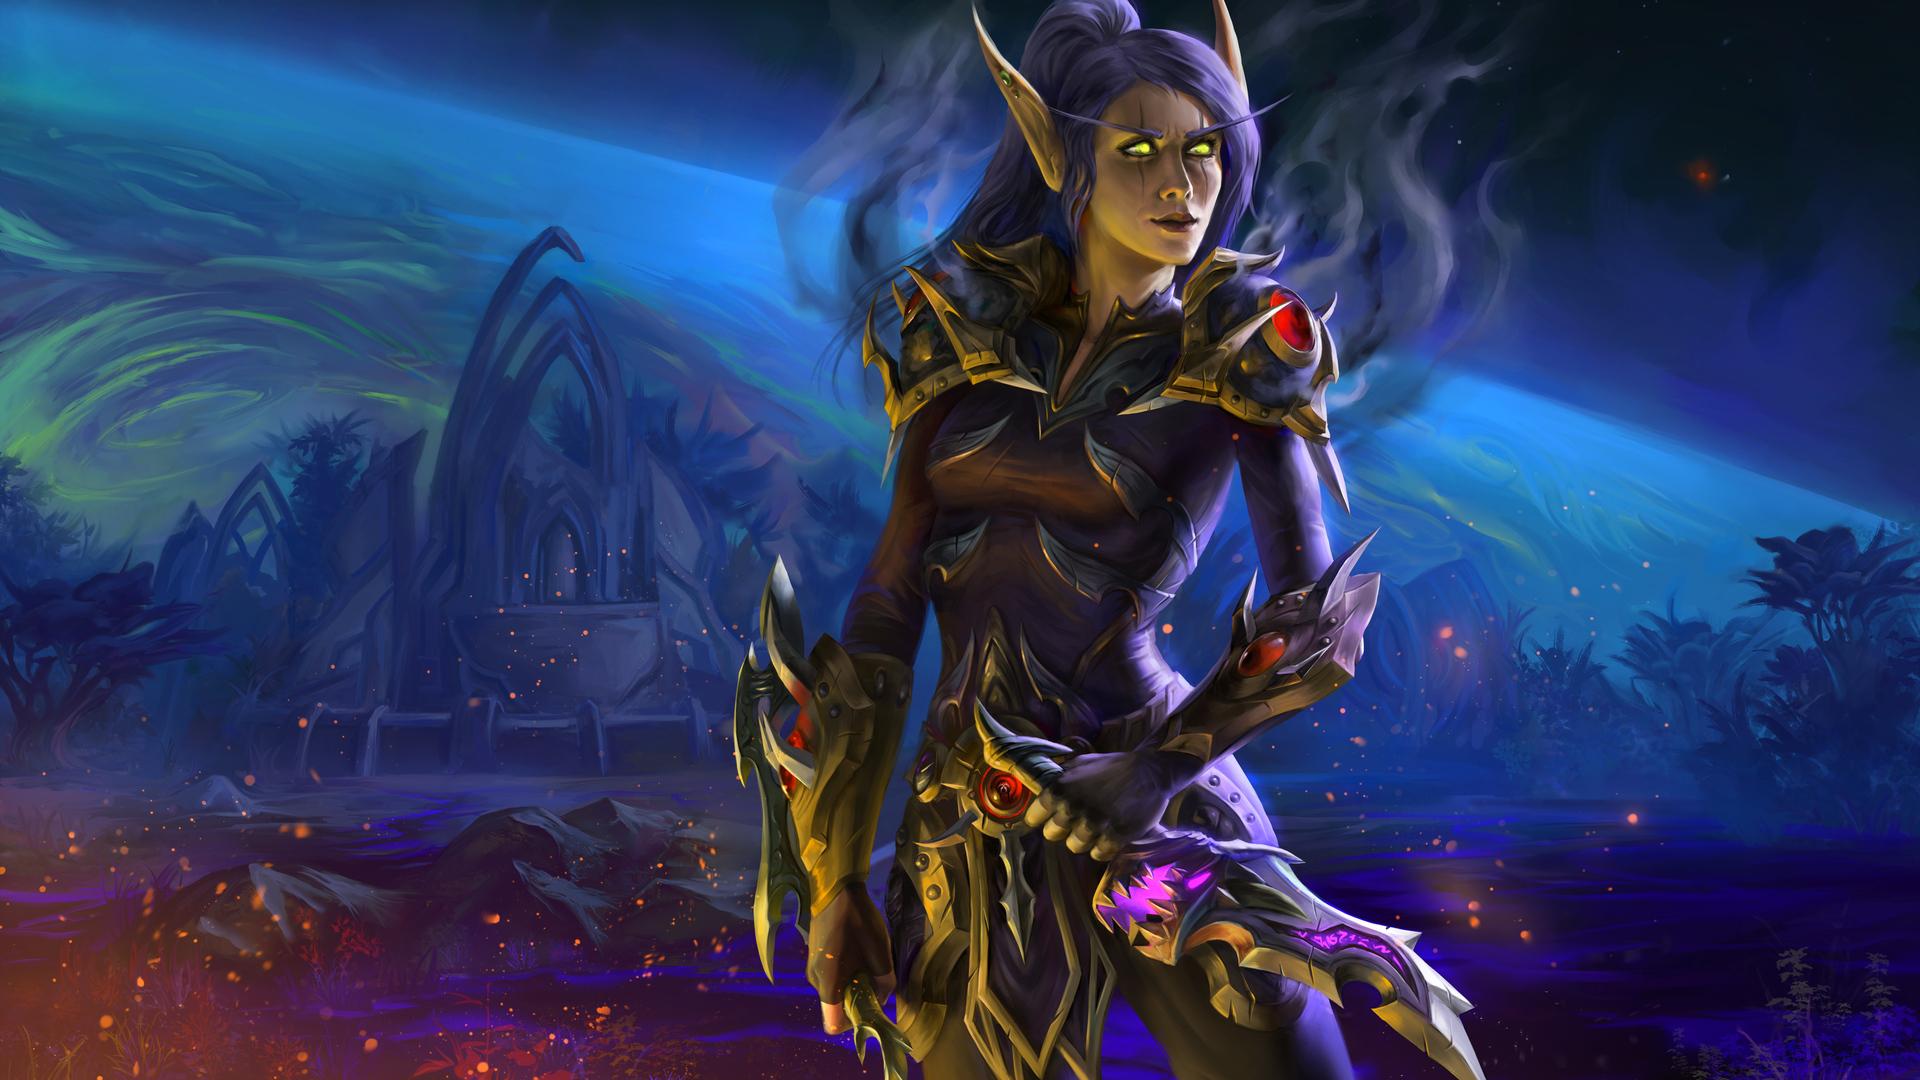 1920x1080 World Of Warcraft Senneria Laptop Full HD 1080P ...